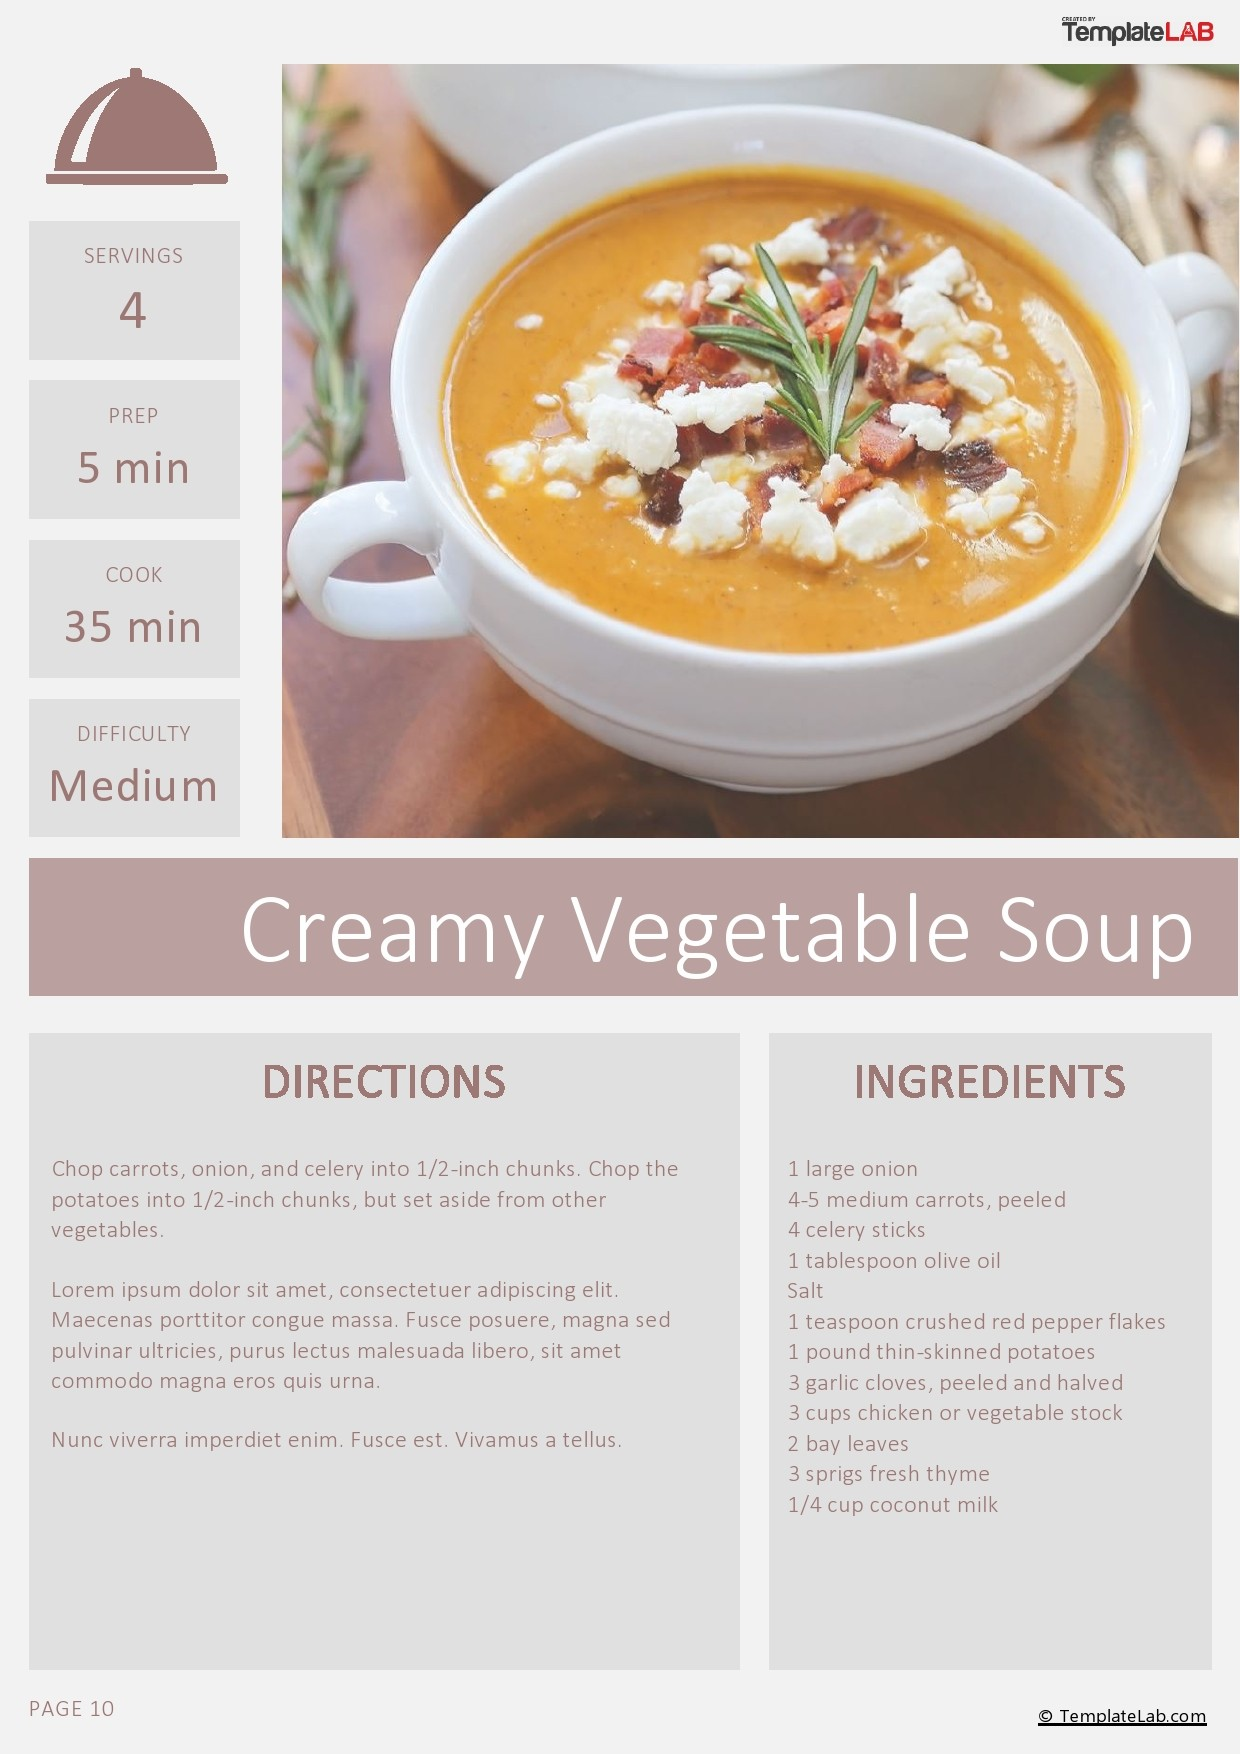 Free Cookbook Template 02 - TemplateLab.com